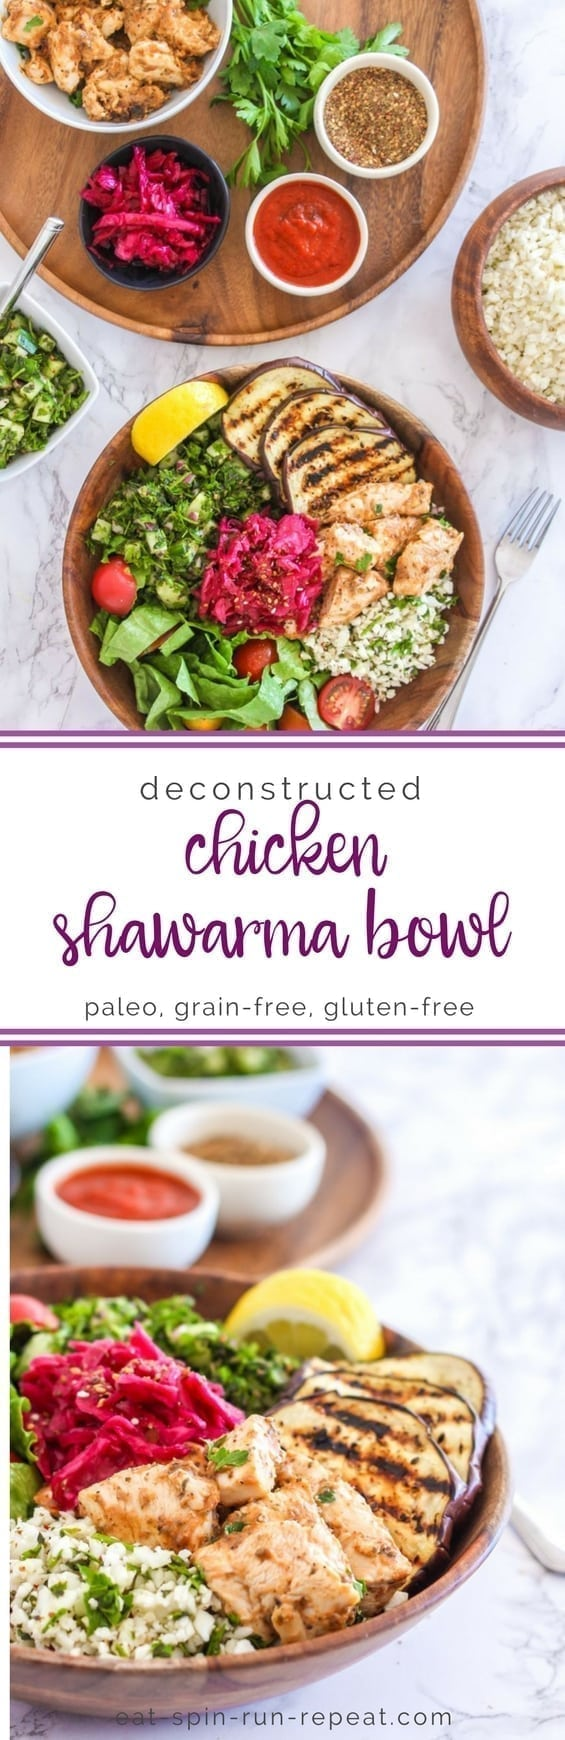 Chicken Shawarma Bowls - paleo, grain-free and gluten-free    Eat Spin Run Repeat